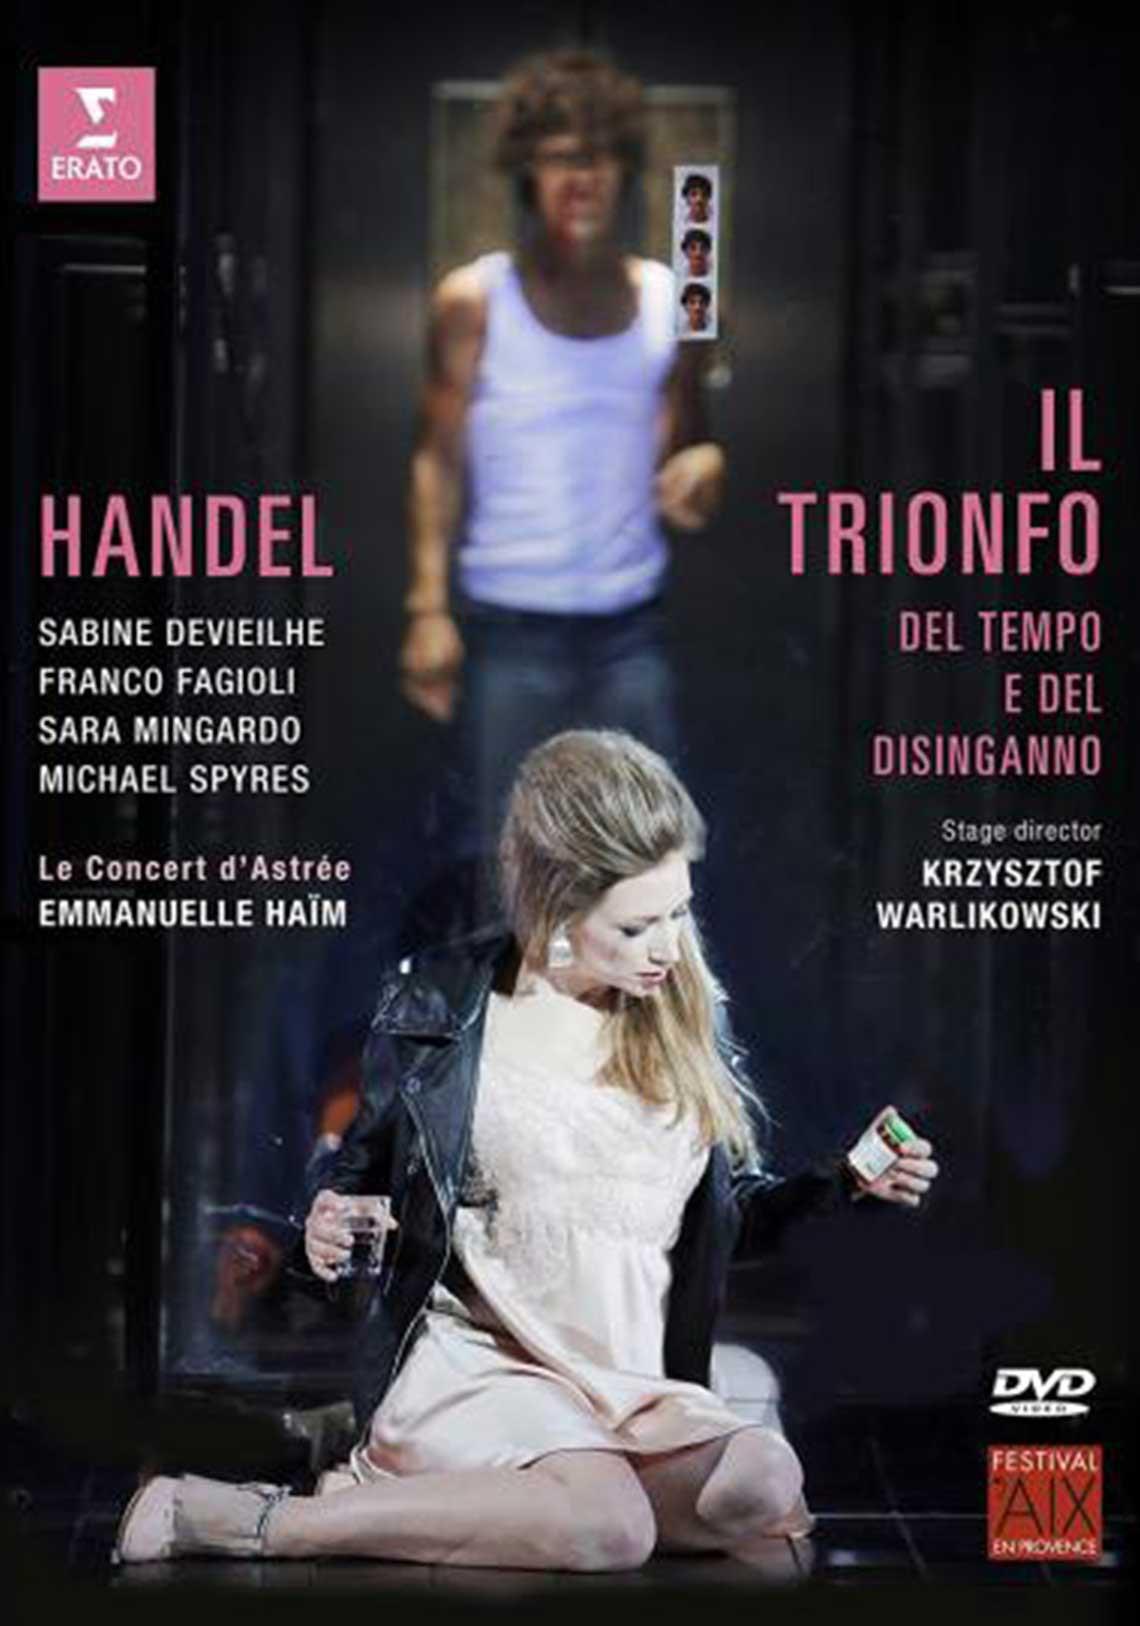 Cover DVD Trionfo Handel